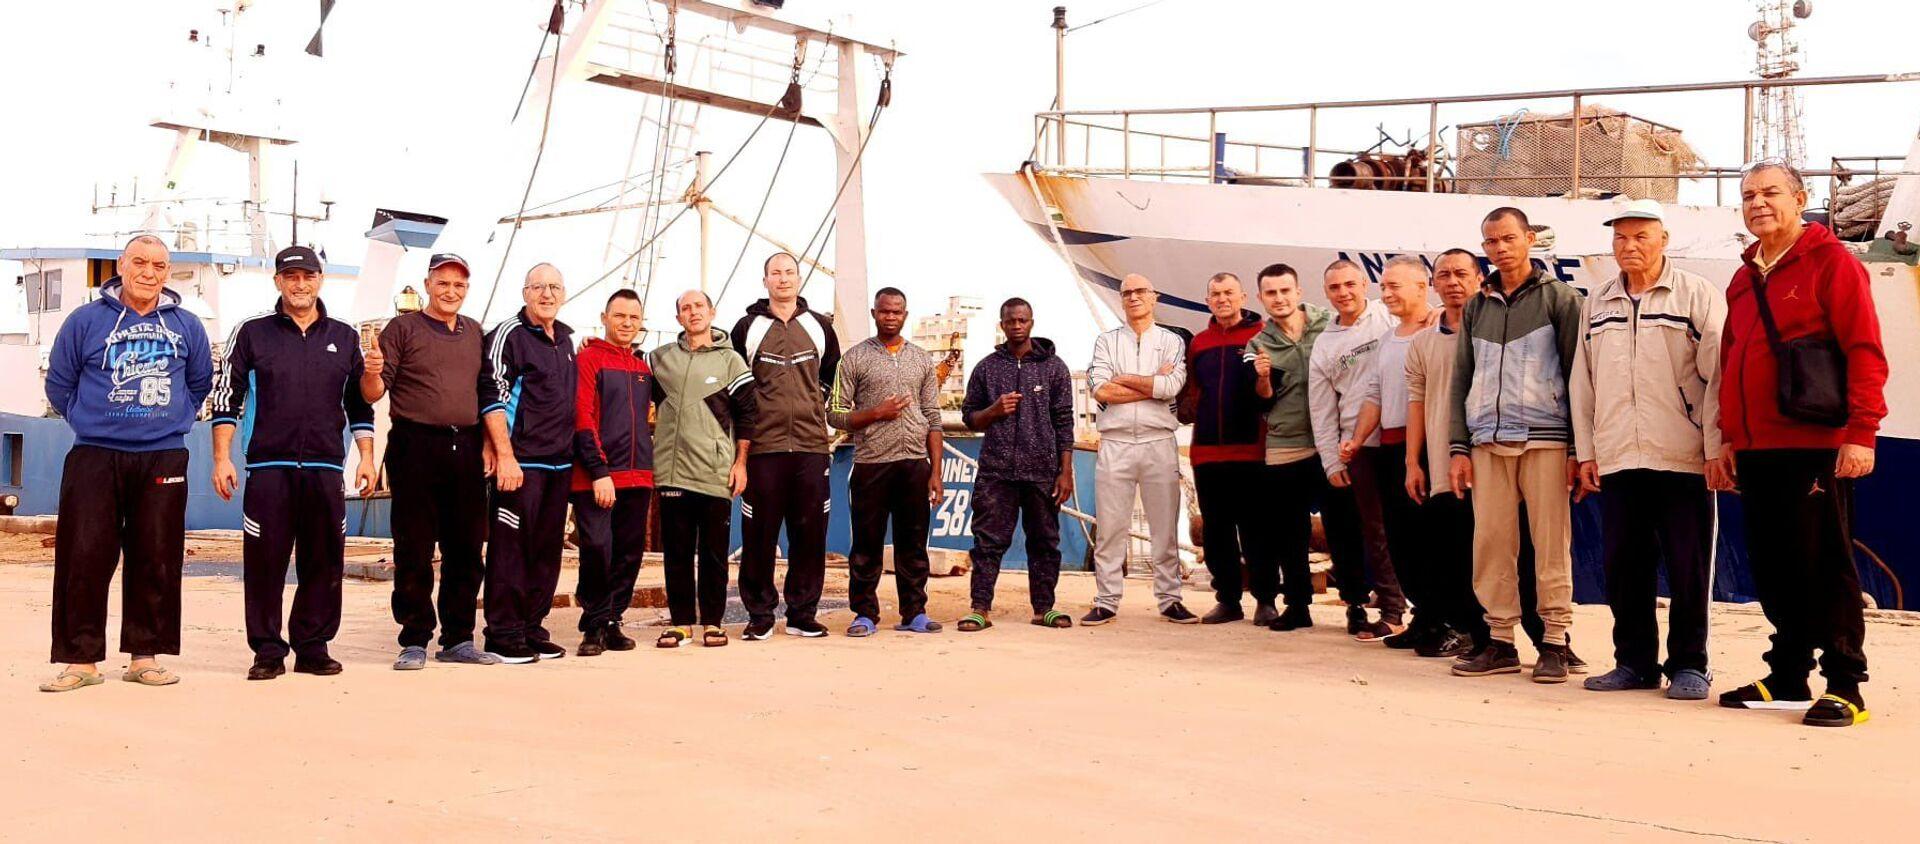 I pescatori italiani liberati a Bengasi - Sputnik Italia, 1920, 20.12.2020